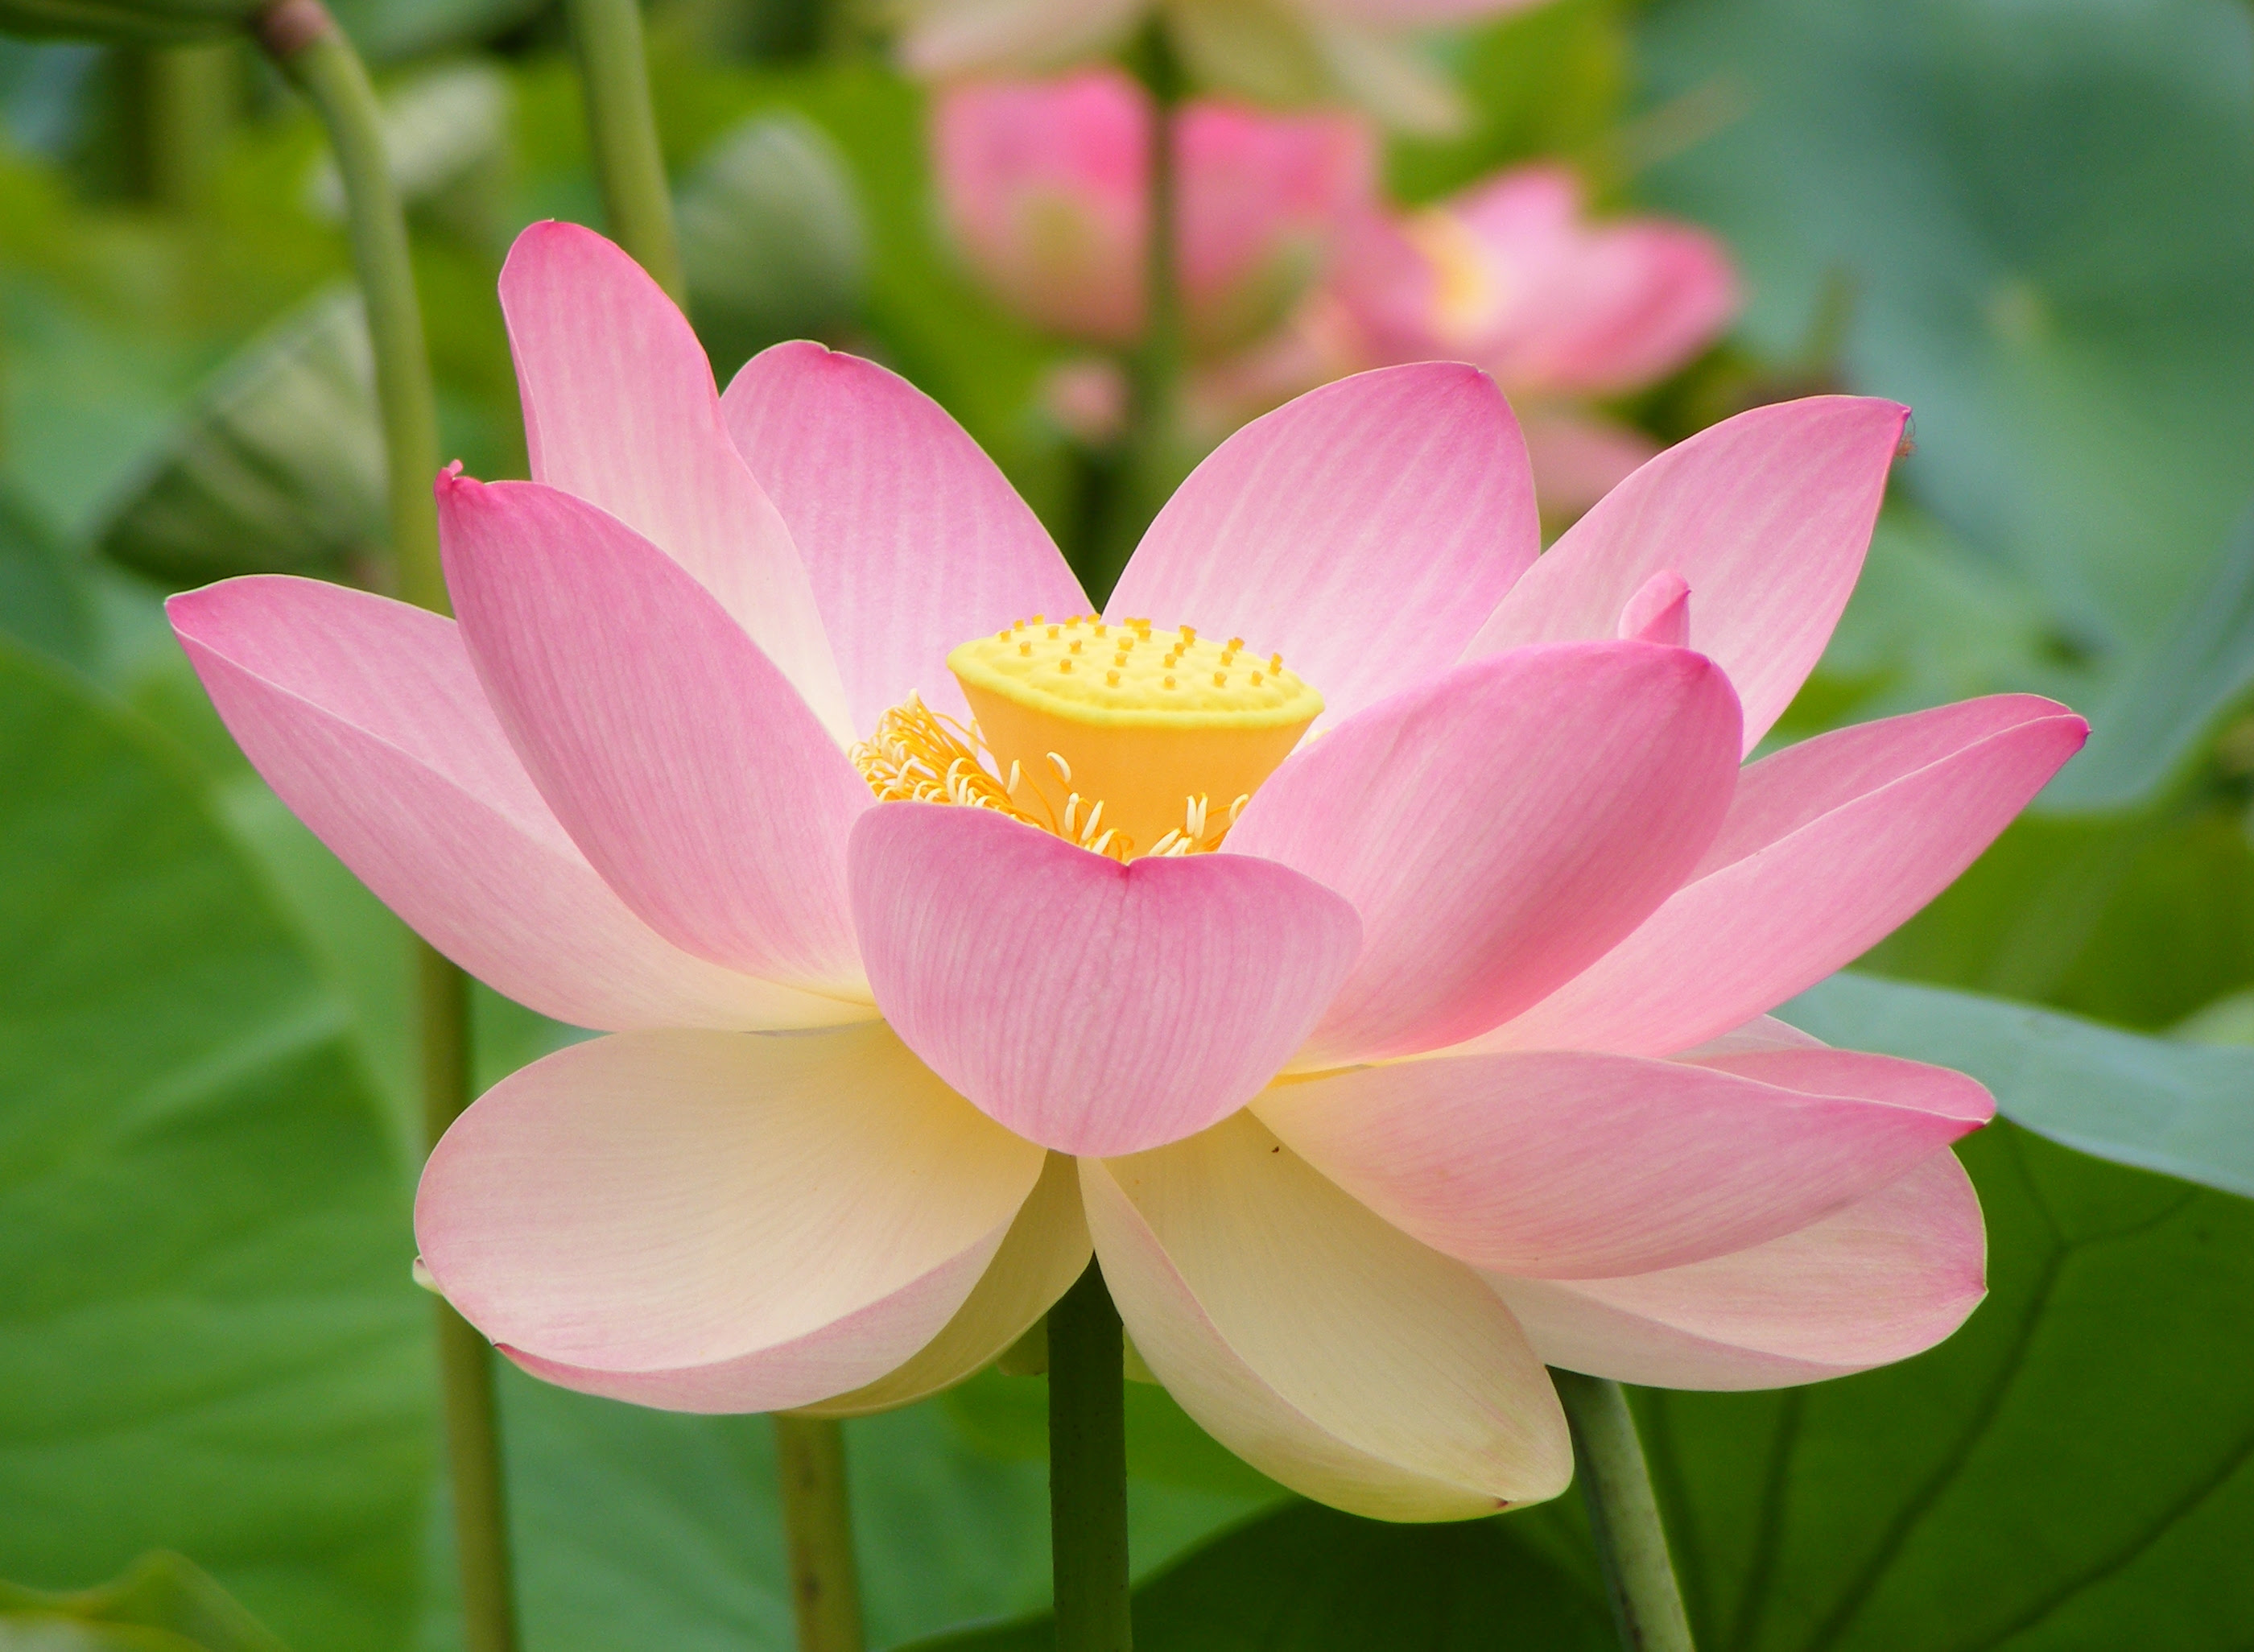 Zen Buddhist Chaplains At Beth Israel Medical Center Pallimed